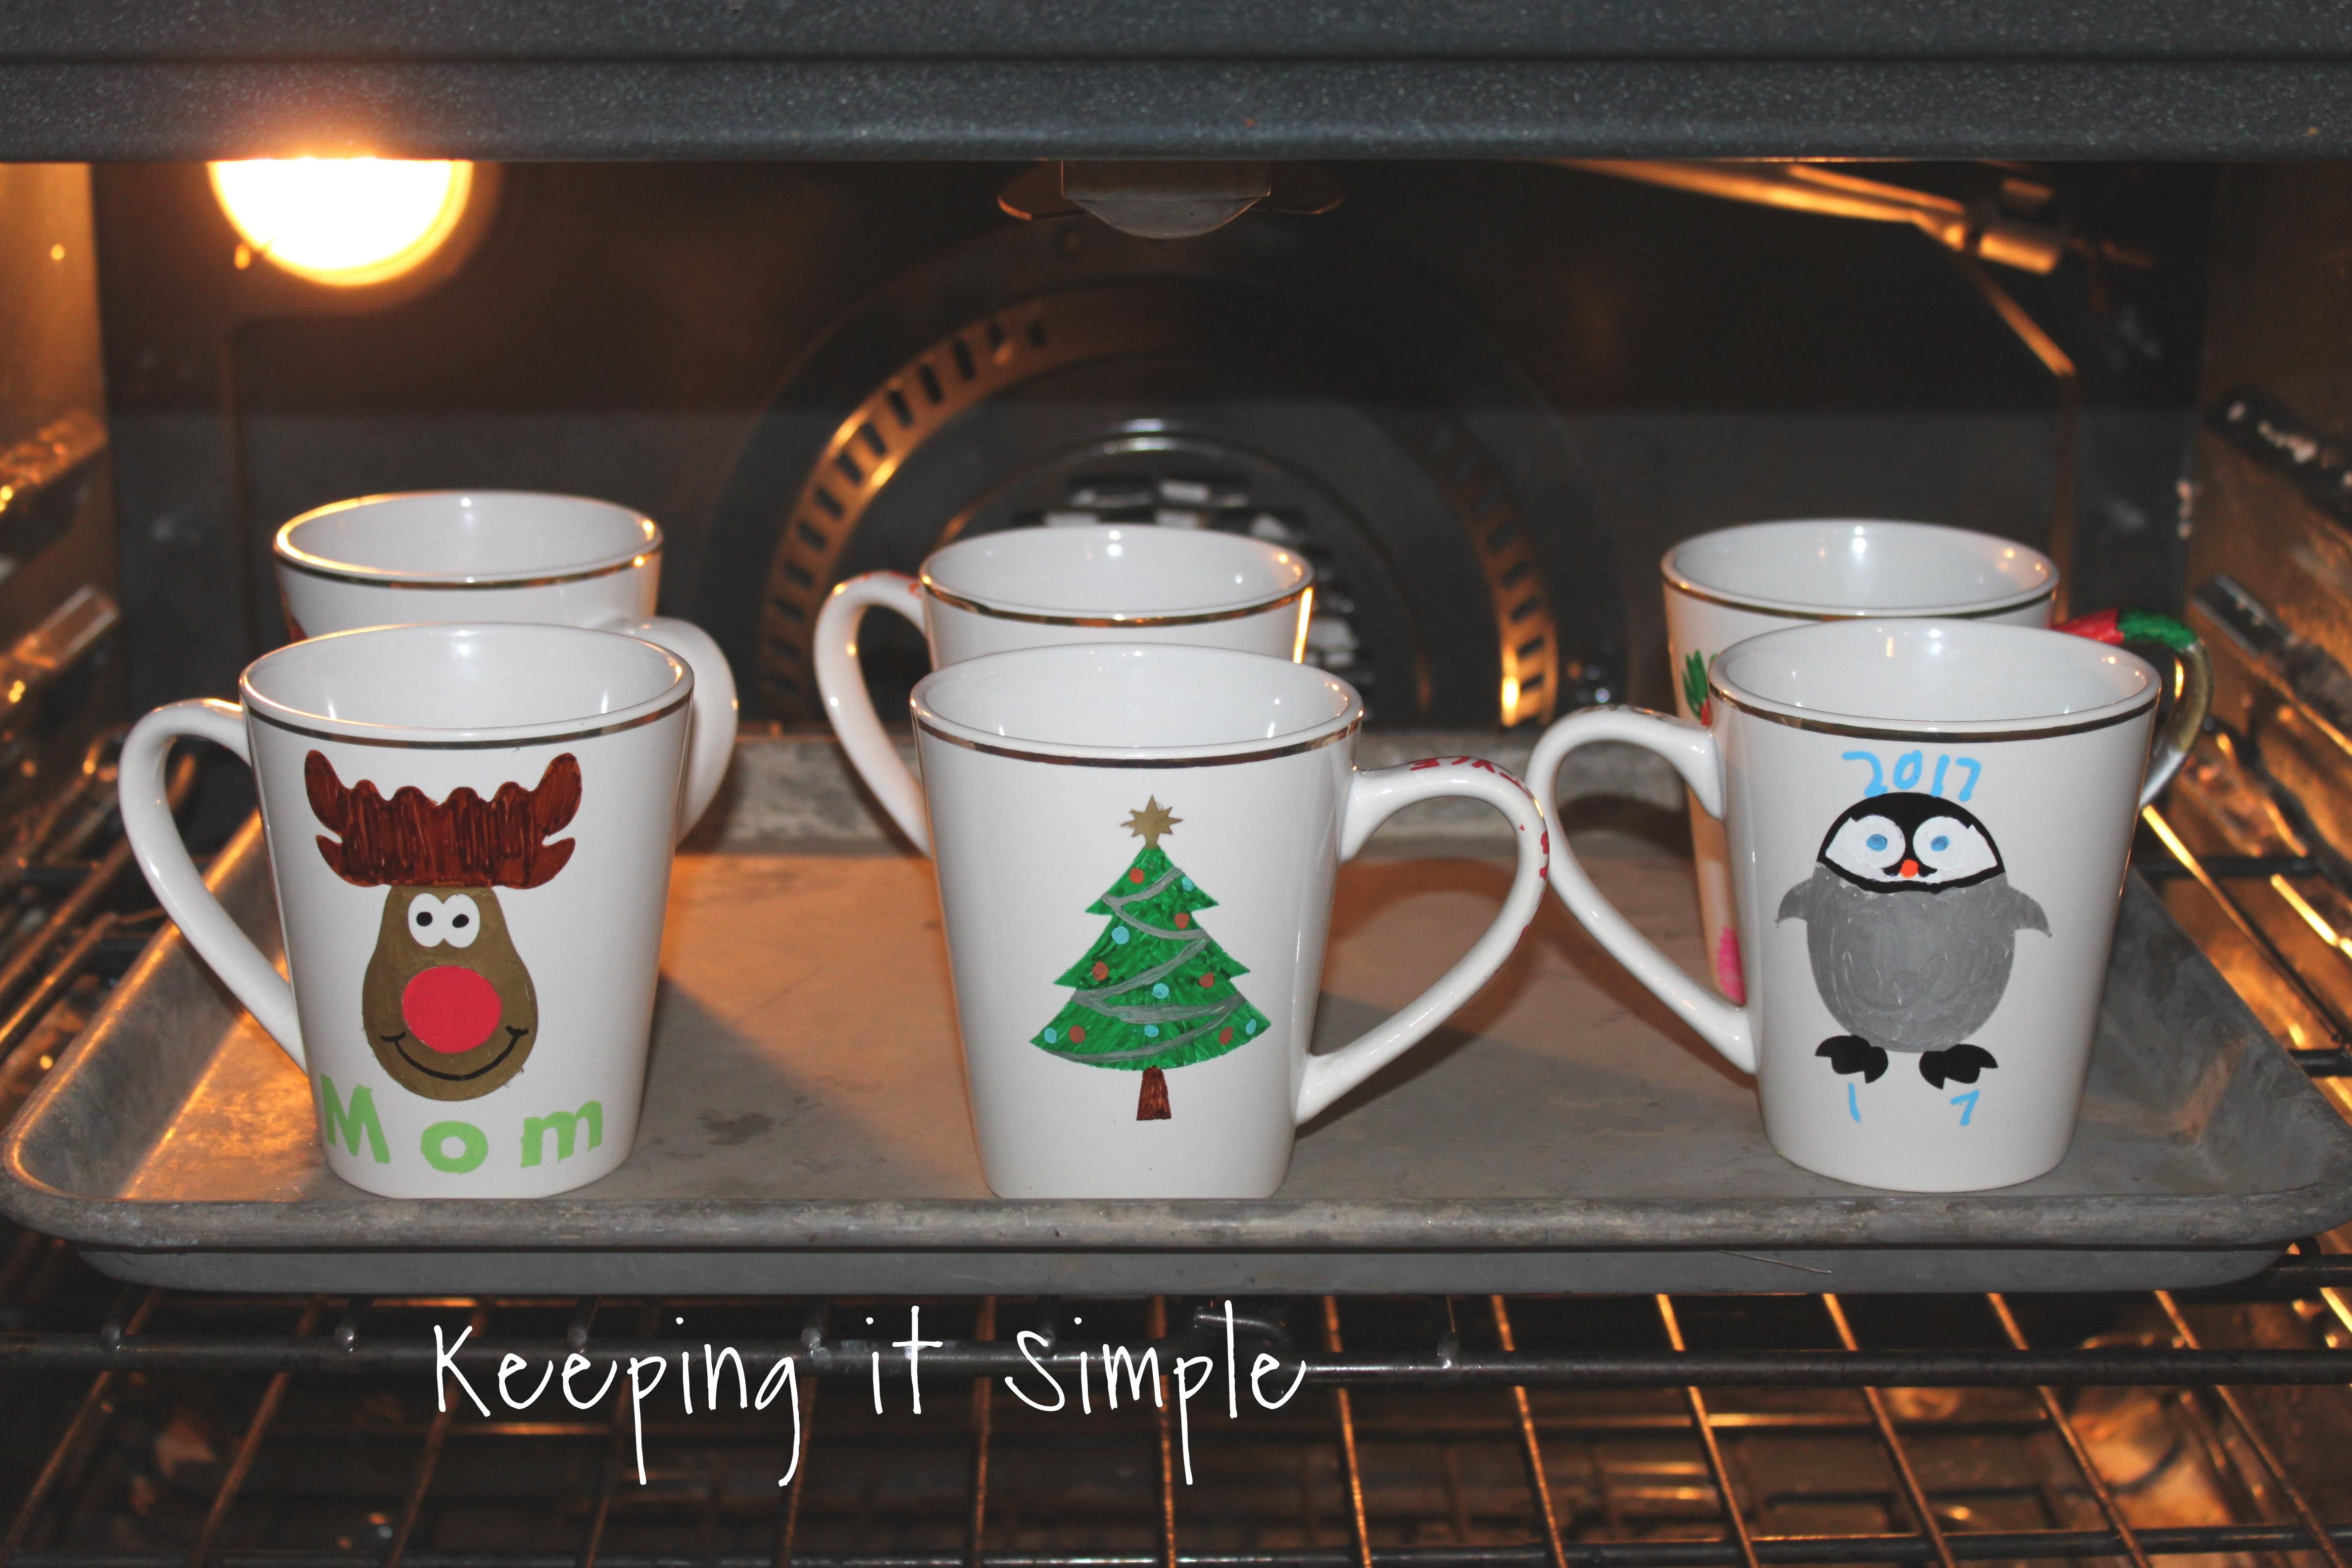 Diy Personalized Christmas Mugs 13 2 Keeping It Simple